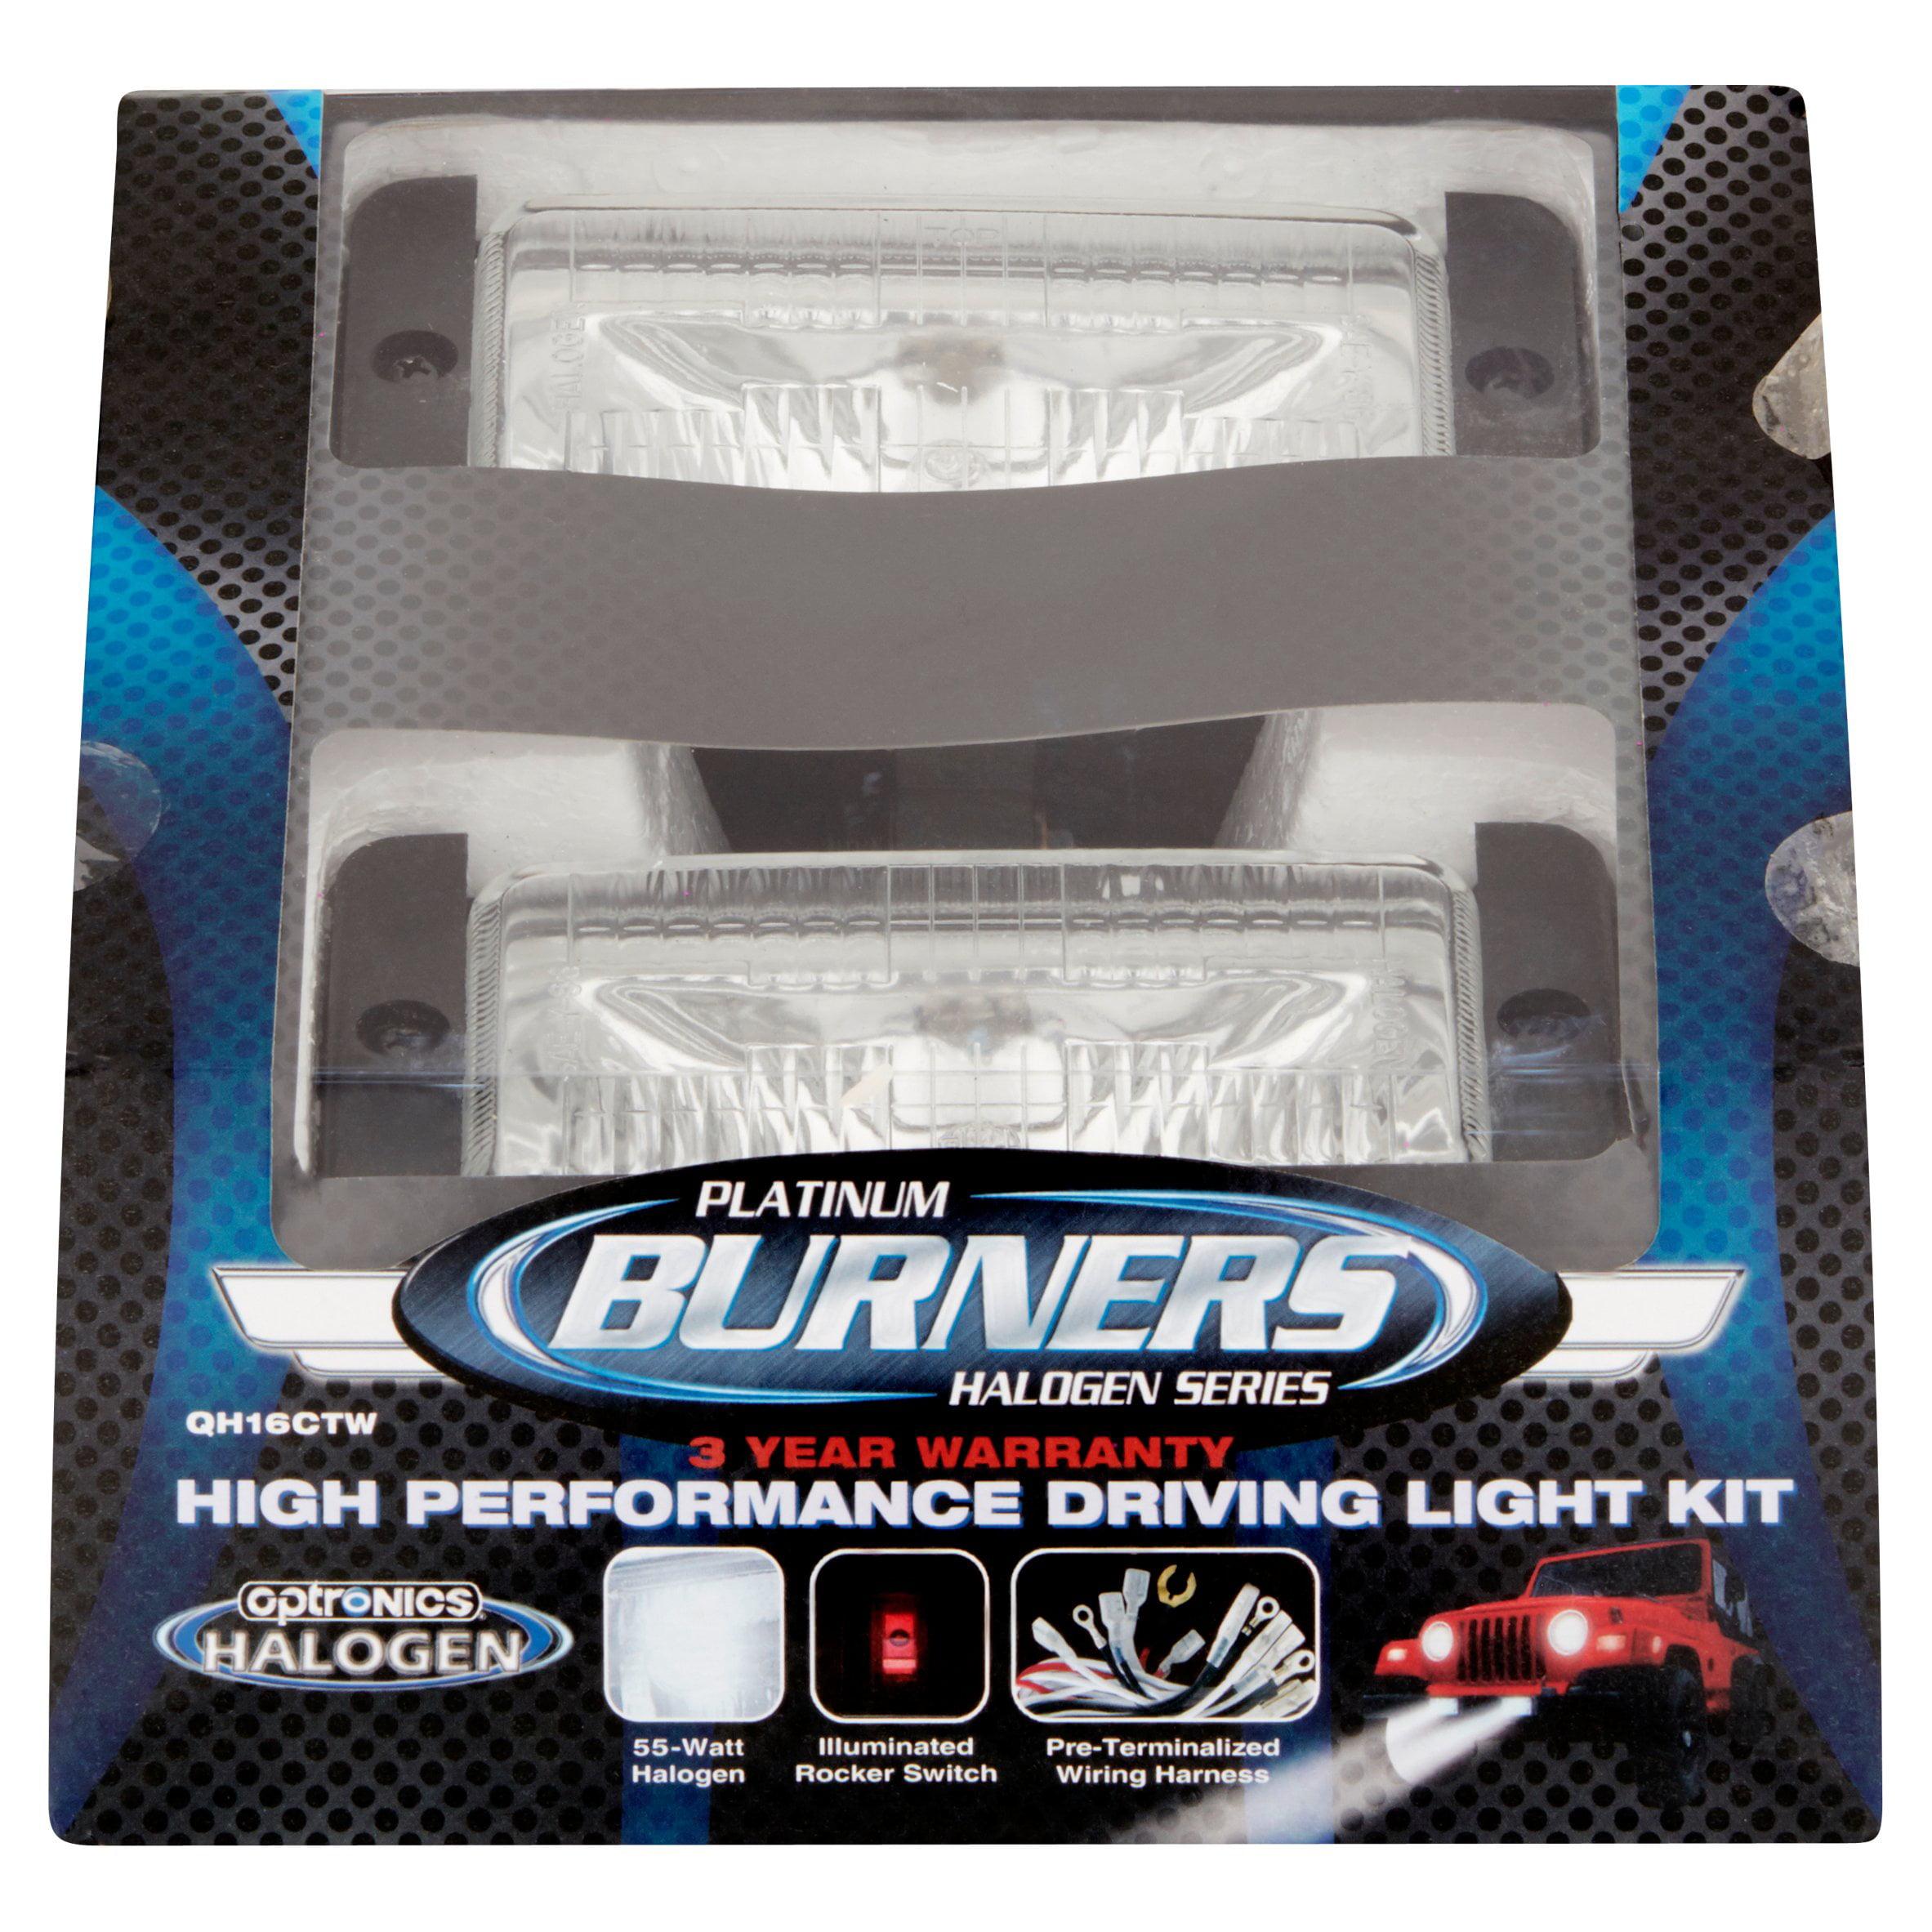 Optronics Burners Platinum Halogen Series High Performance Driving Light  Kit - Walmart.com